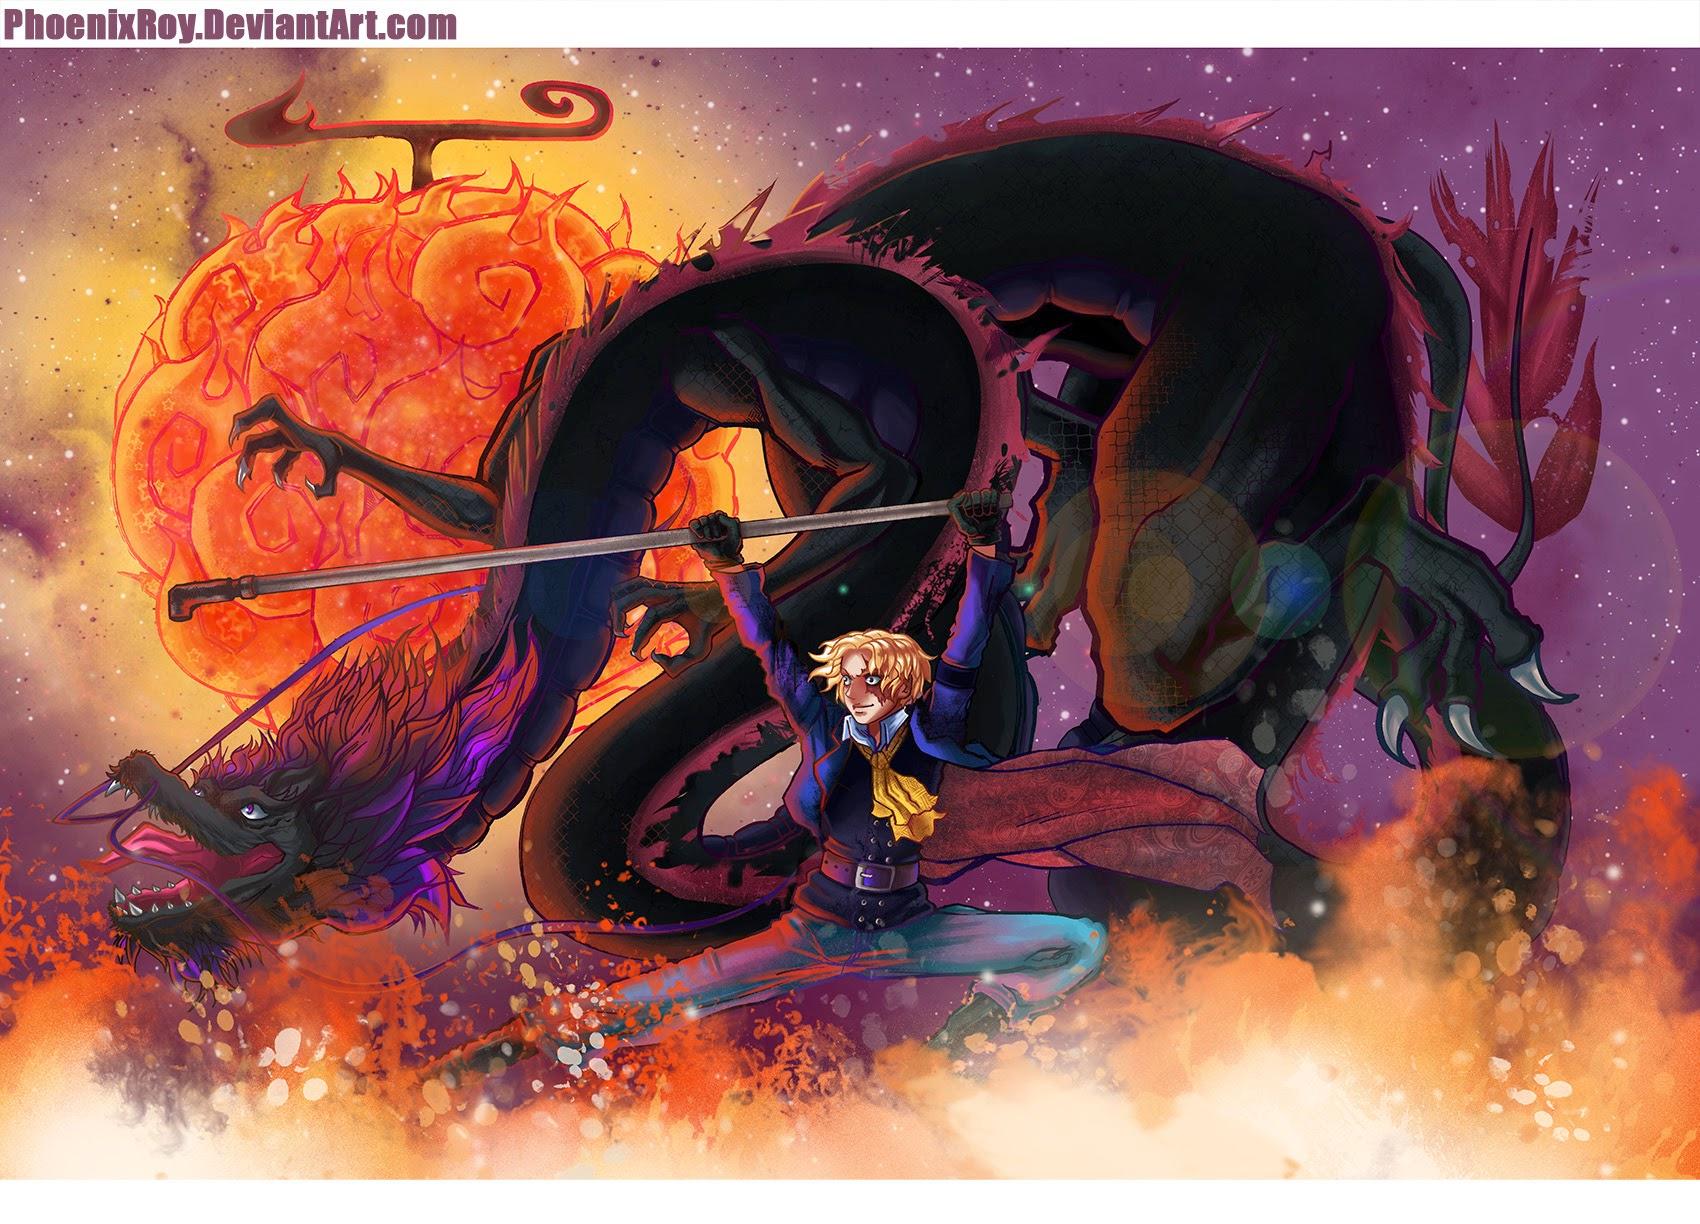 One Piece - Đảo Hải Tặc trang 19